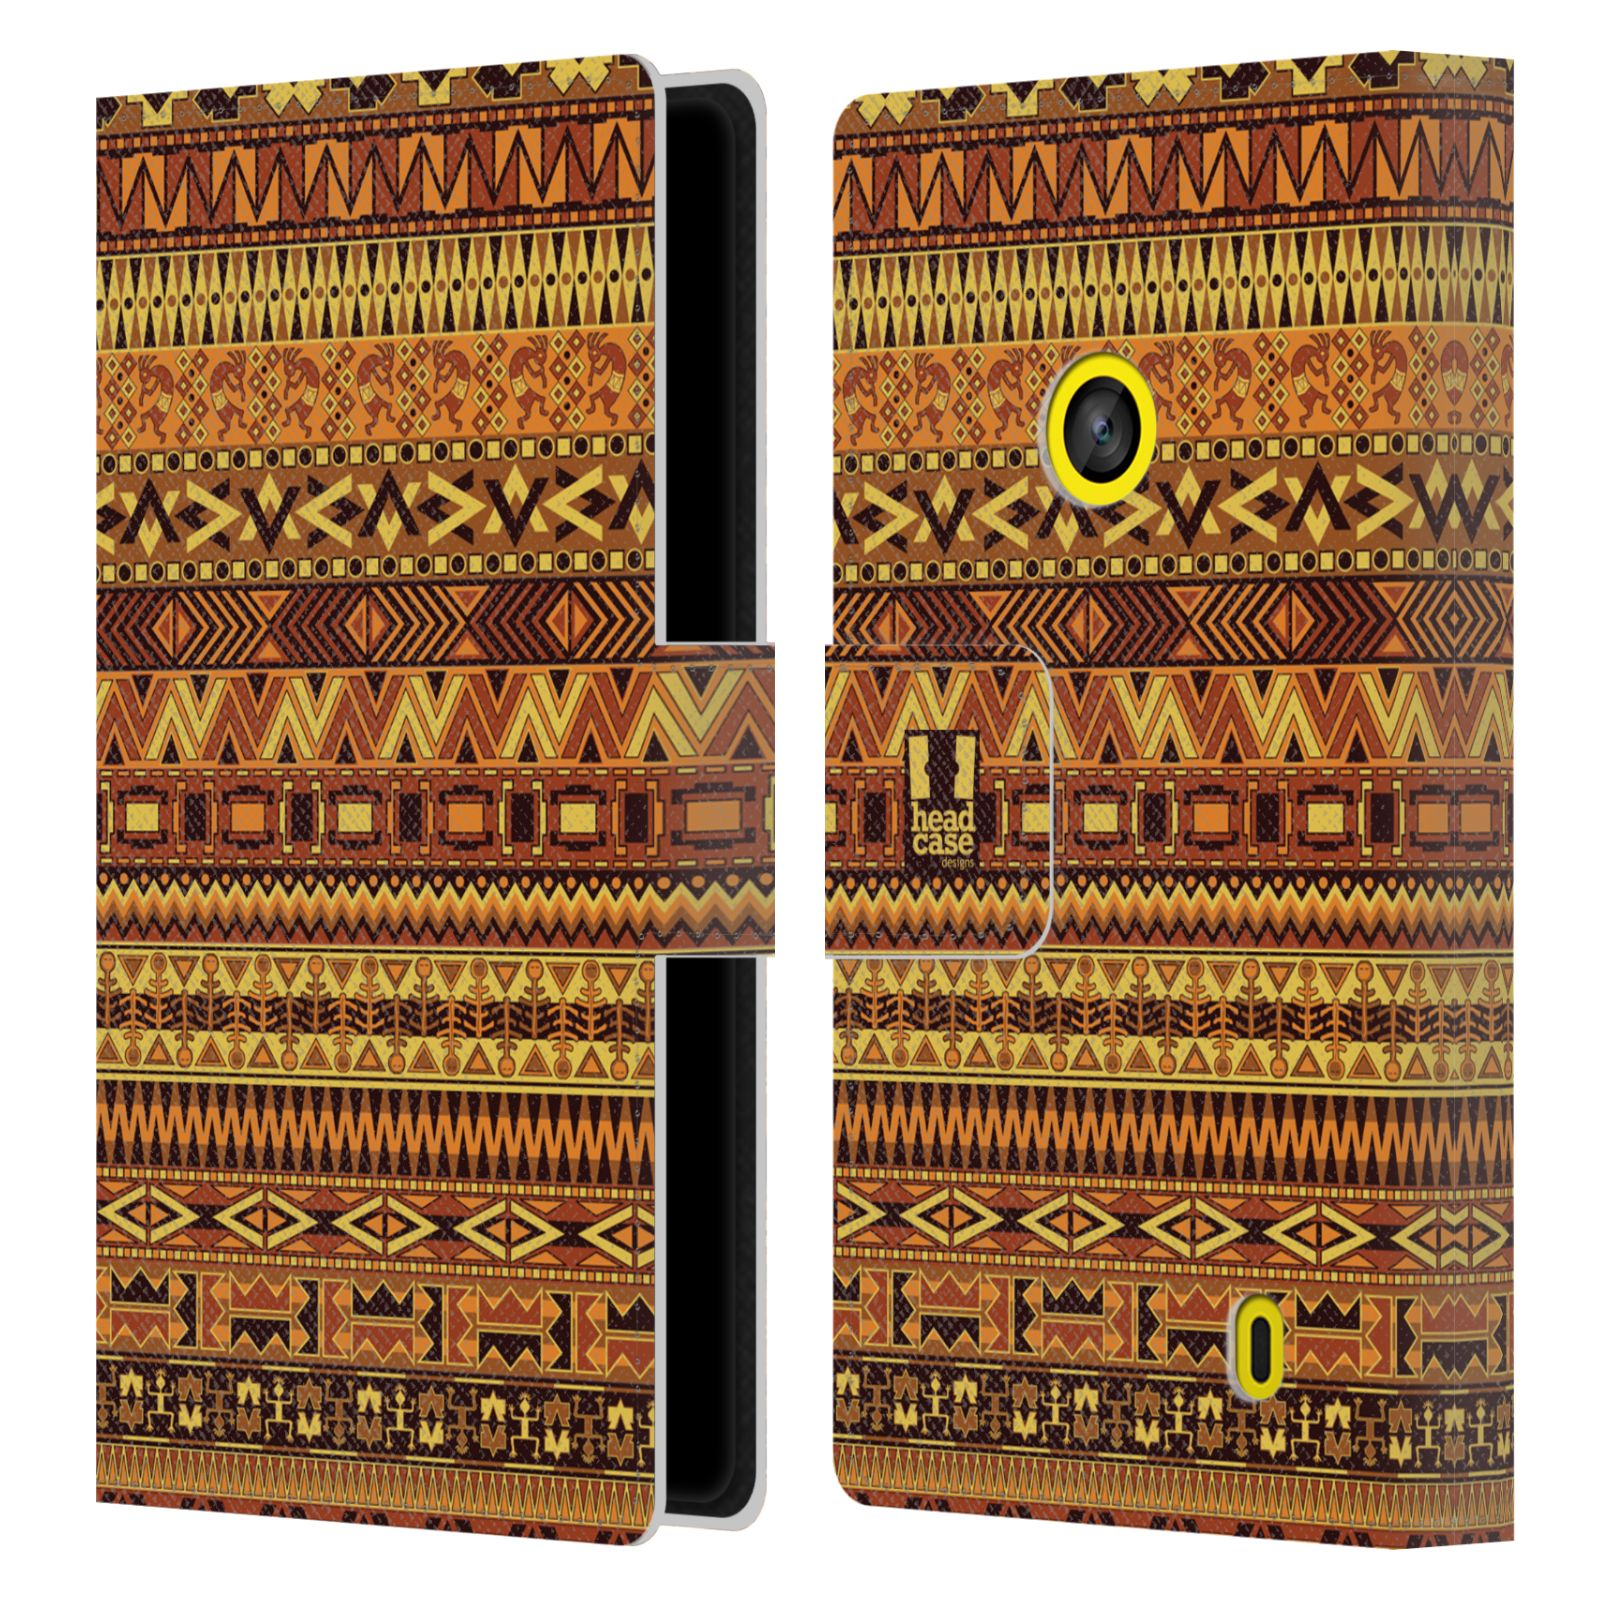 HEAD CASE Flipové pouzdro pro mobil NOKIA LUMIA 520 / 525 Indiánský vzor YELLOW žlutá